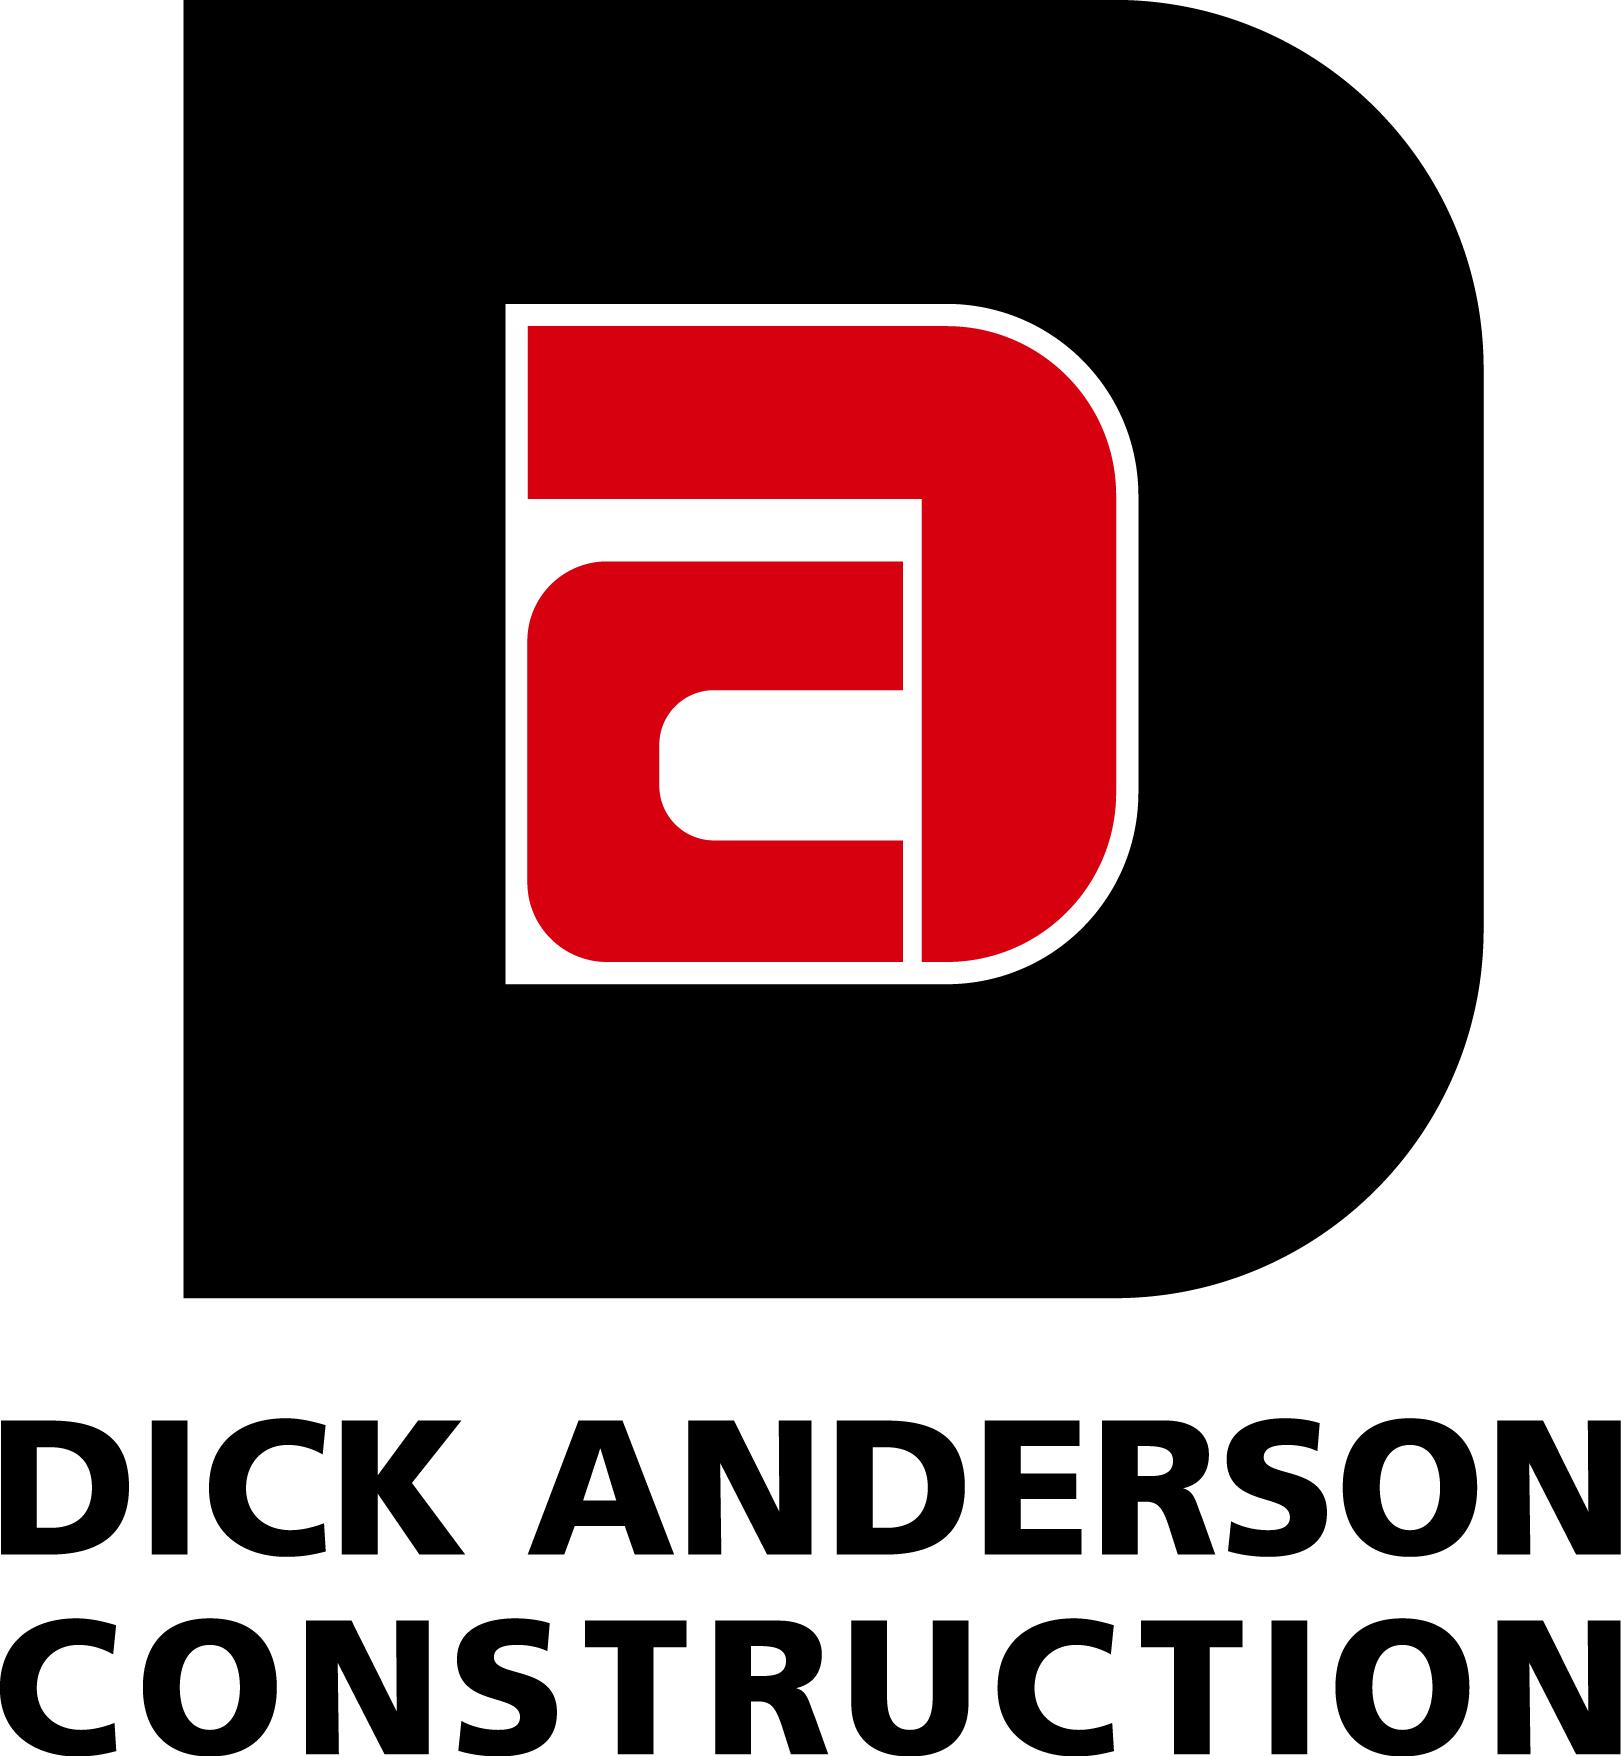 Dick Anderson Construction, Inc